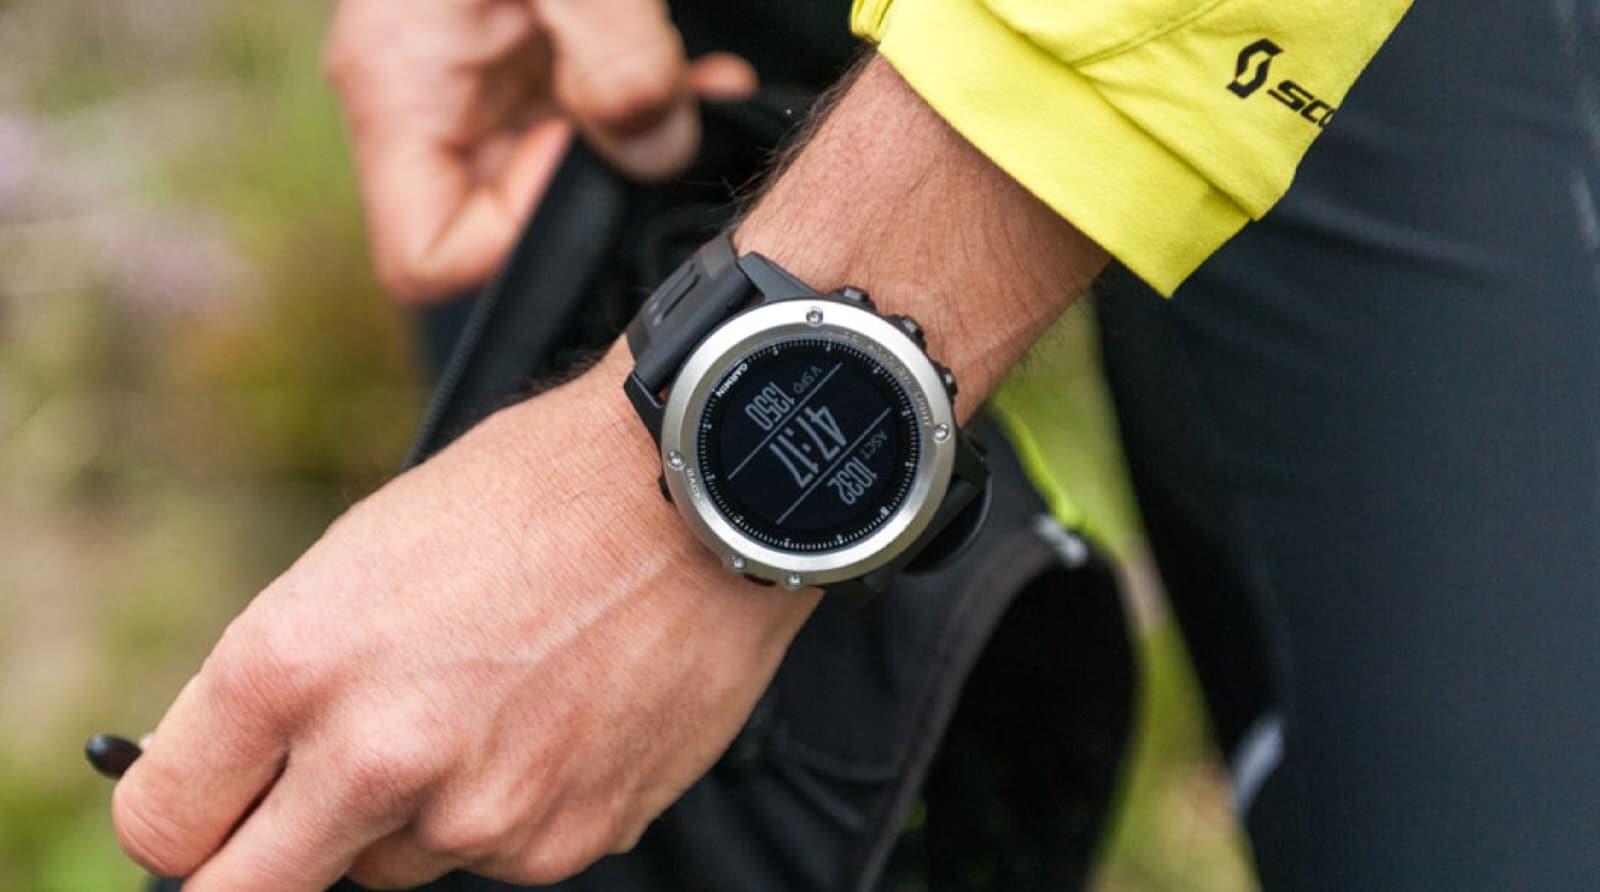 Us Navy Equips Pilots With Garmin Fenix 3 Sports Watch